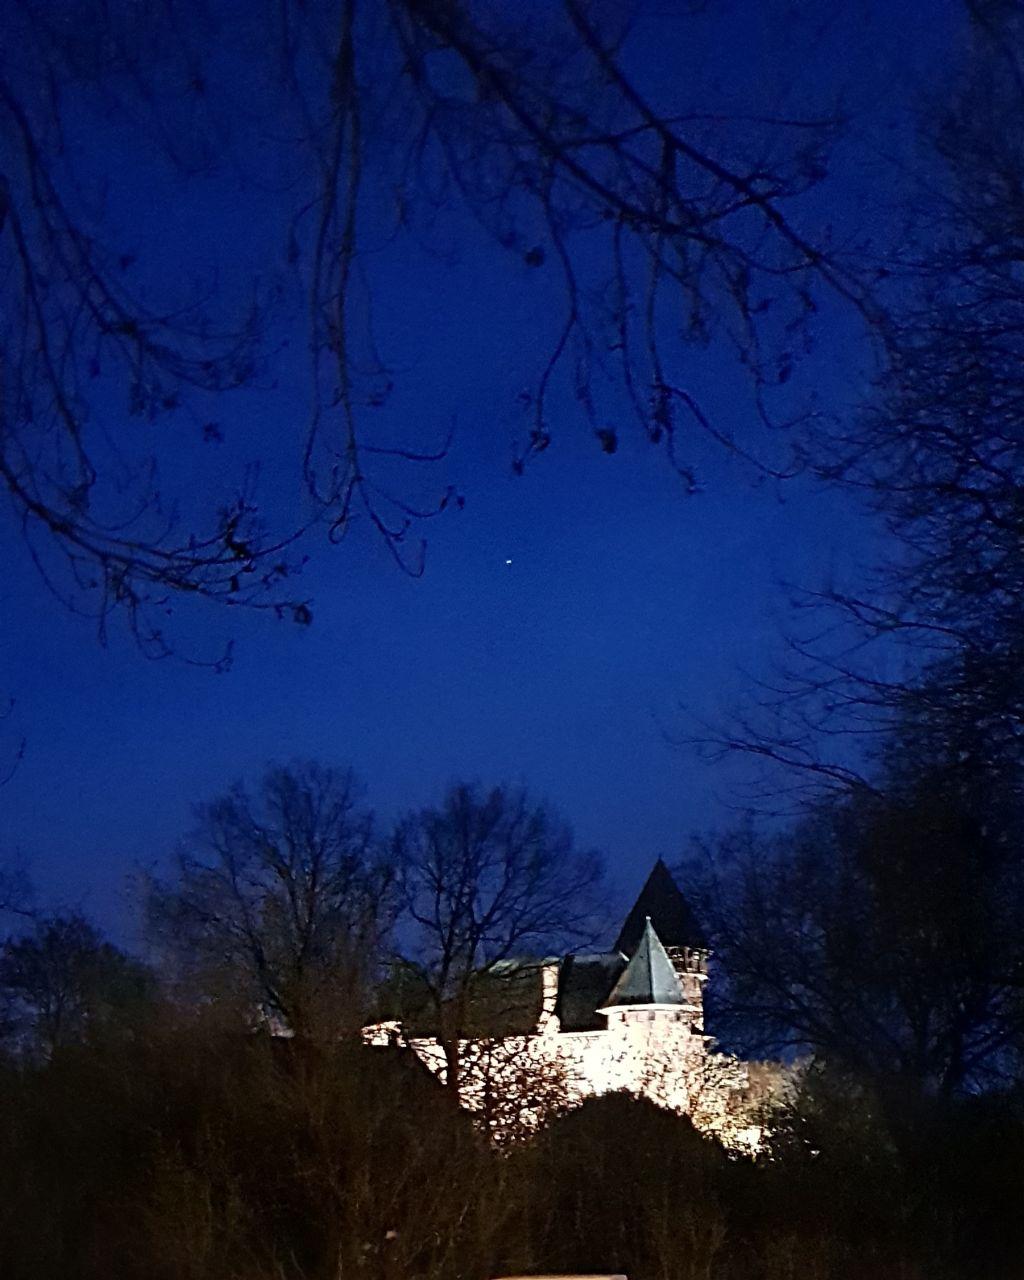 #freetoedit#castle#myphotography